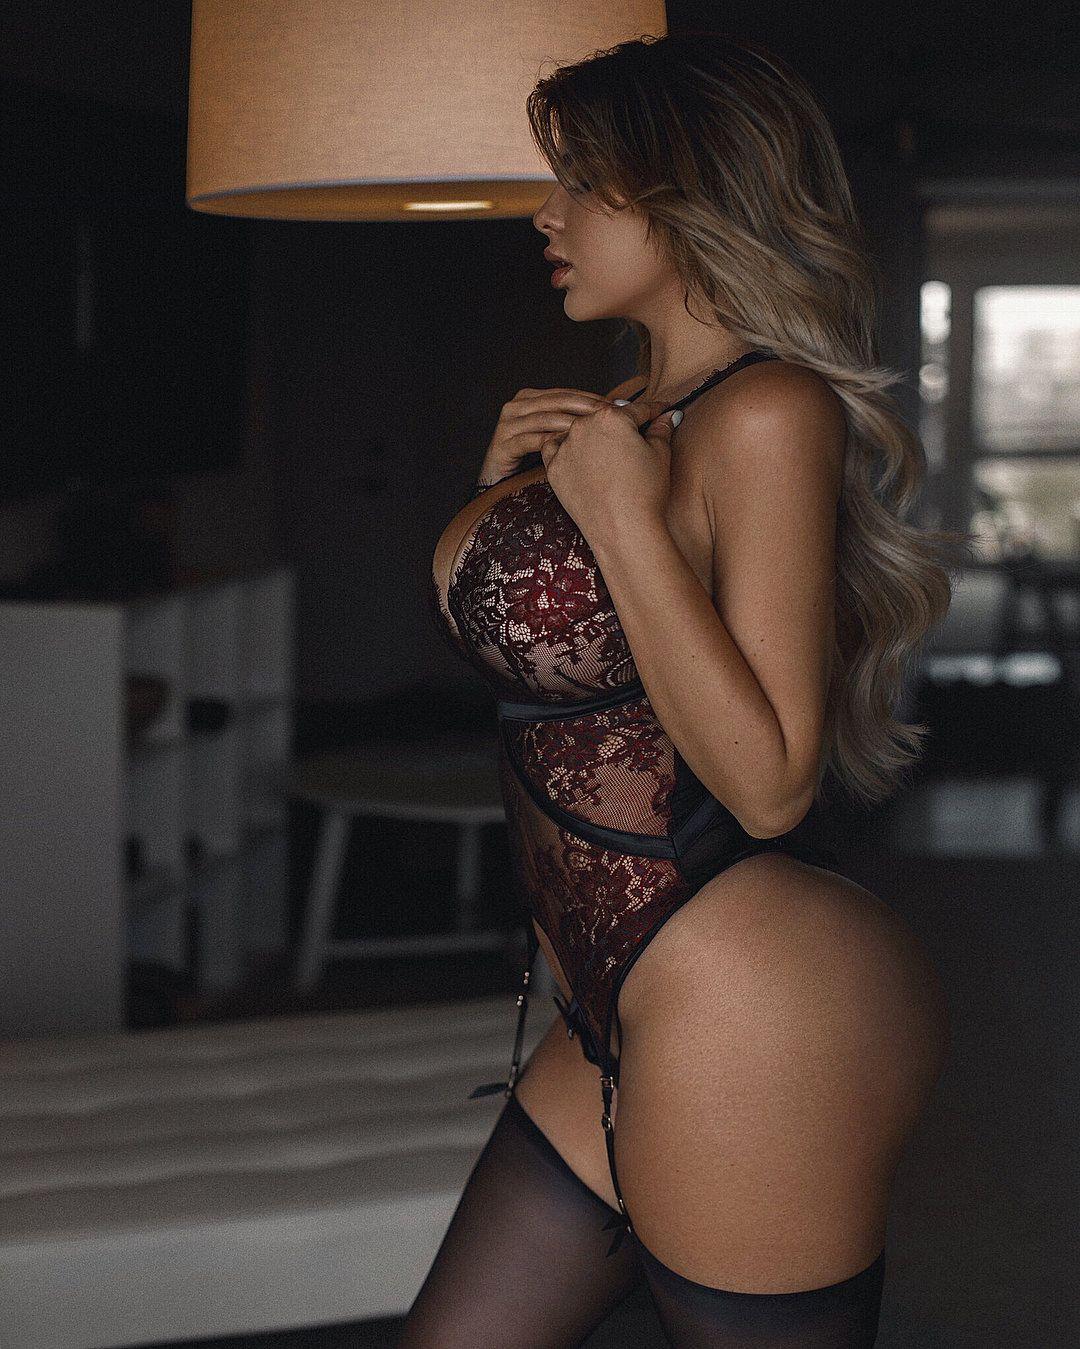 Sexy Instagram Models